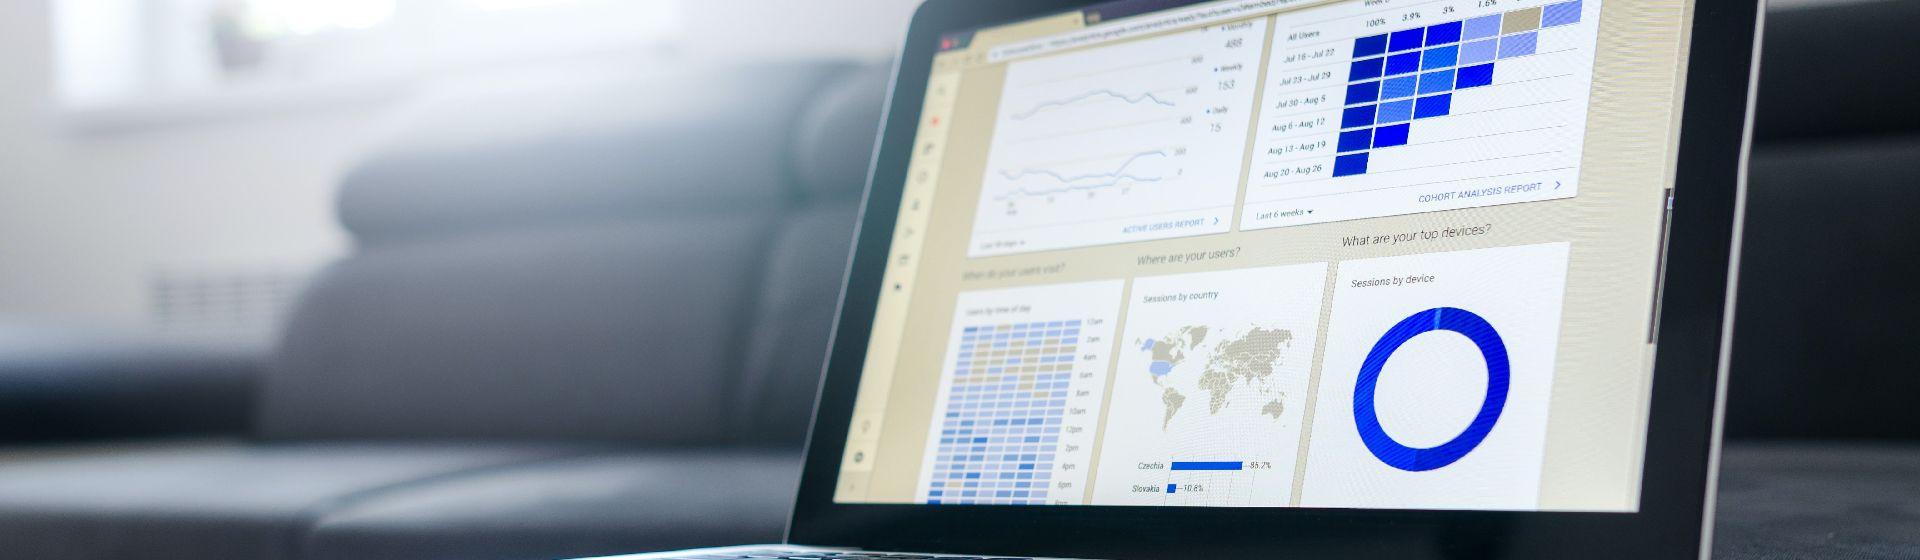 Establishing Advanced BI Capabilities with Google Looker: A Step by Step Tutorial